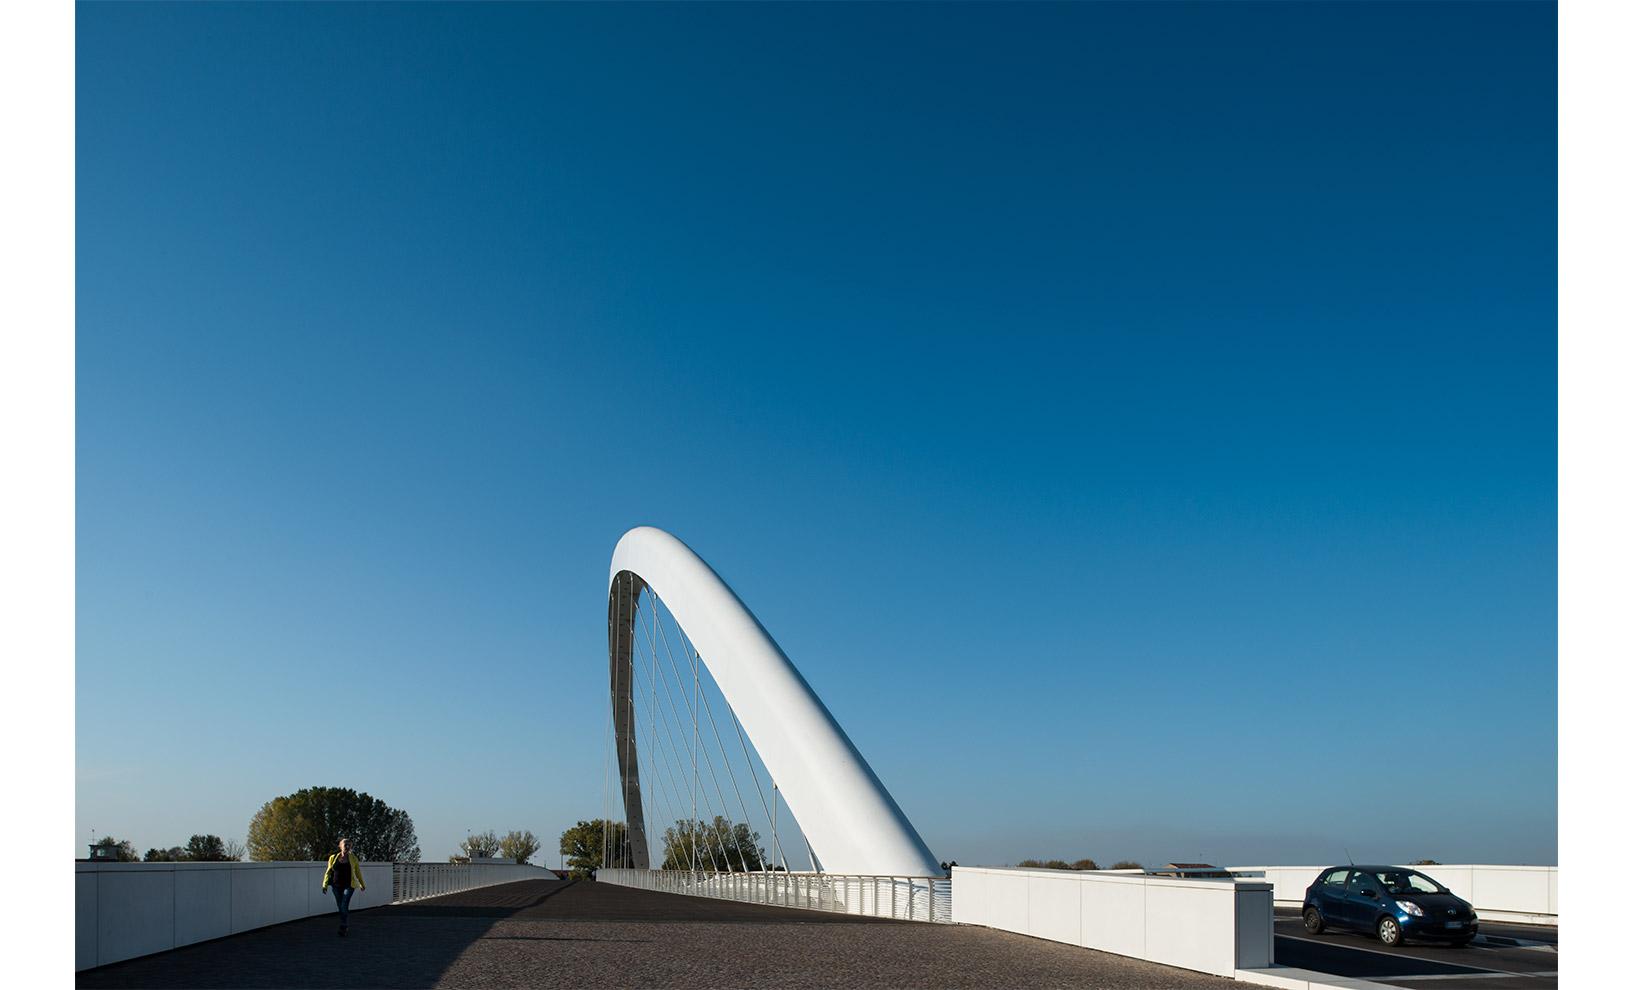 ©marco-tacchini-fotografo-ponte-cittadella-richar-meier-and-partners_14